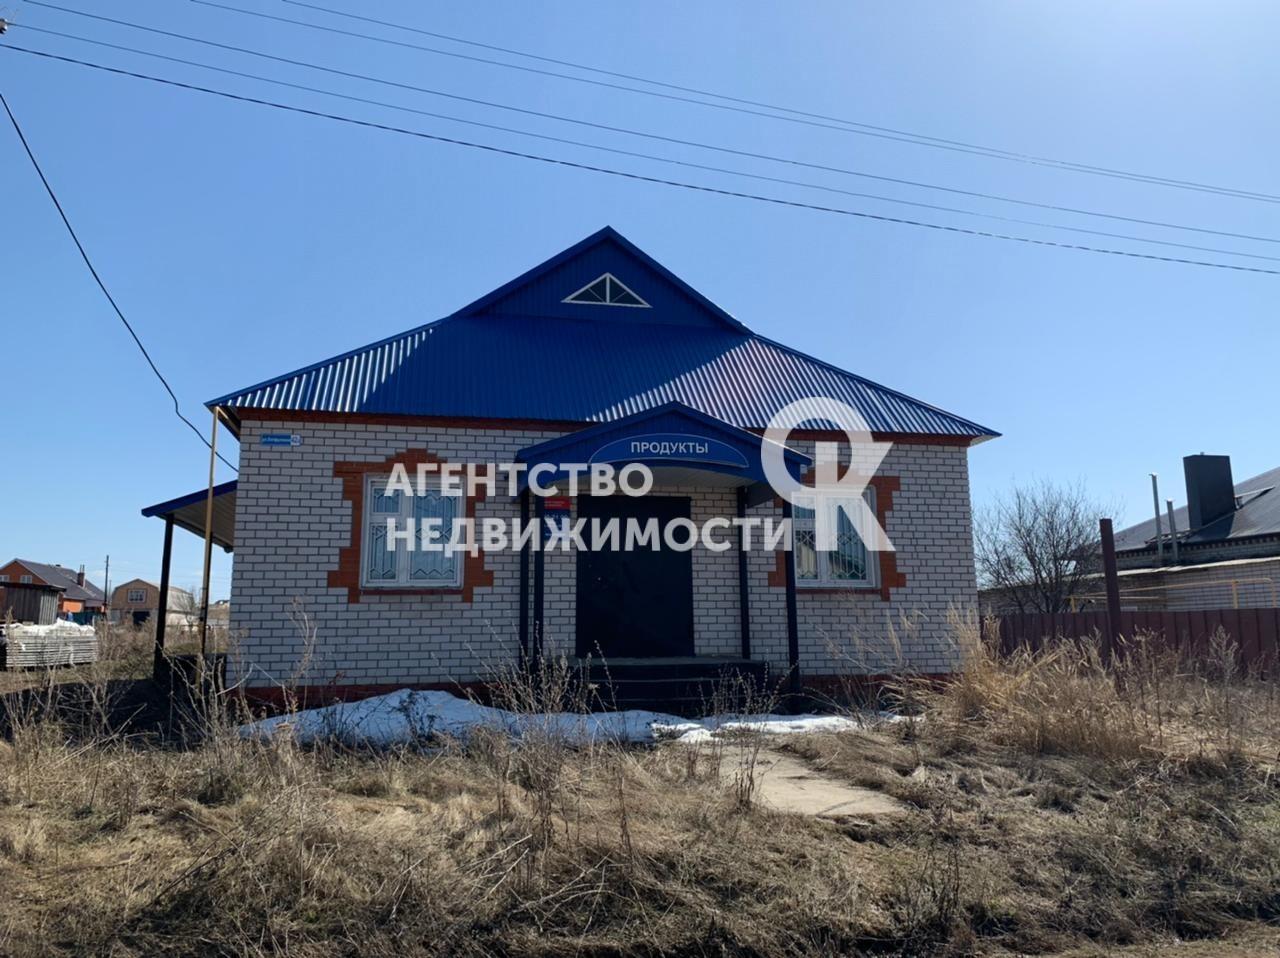 Продажа  готового бизнеса Республика Татарстан, г. Арск, М.Лотфуллина ул.